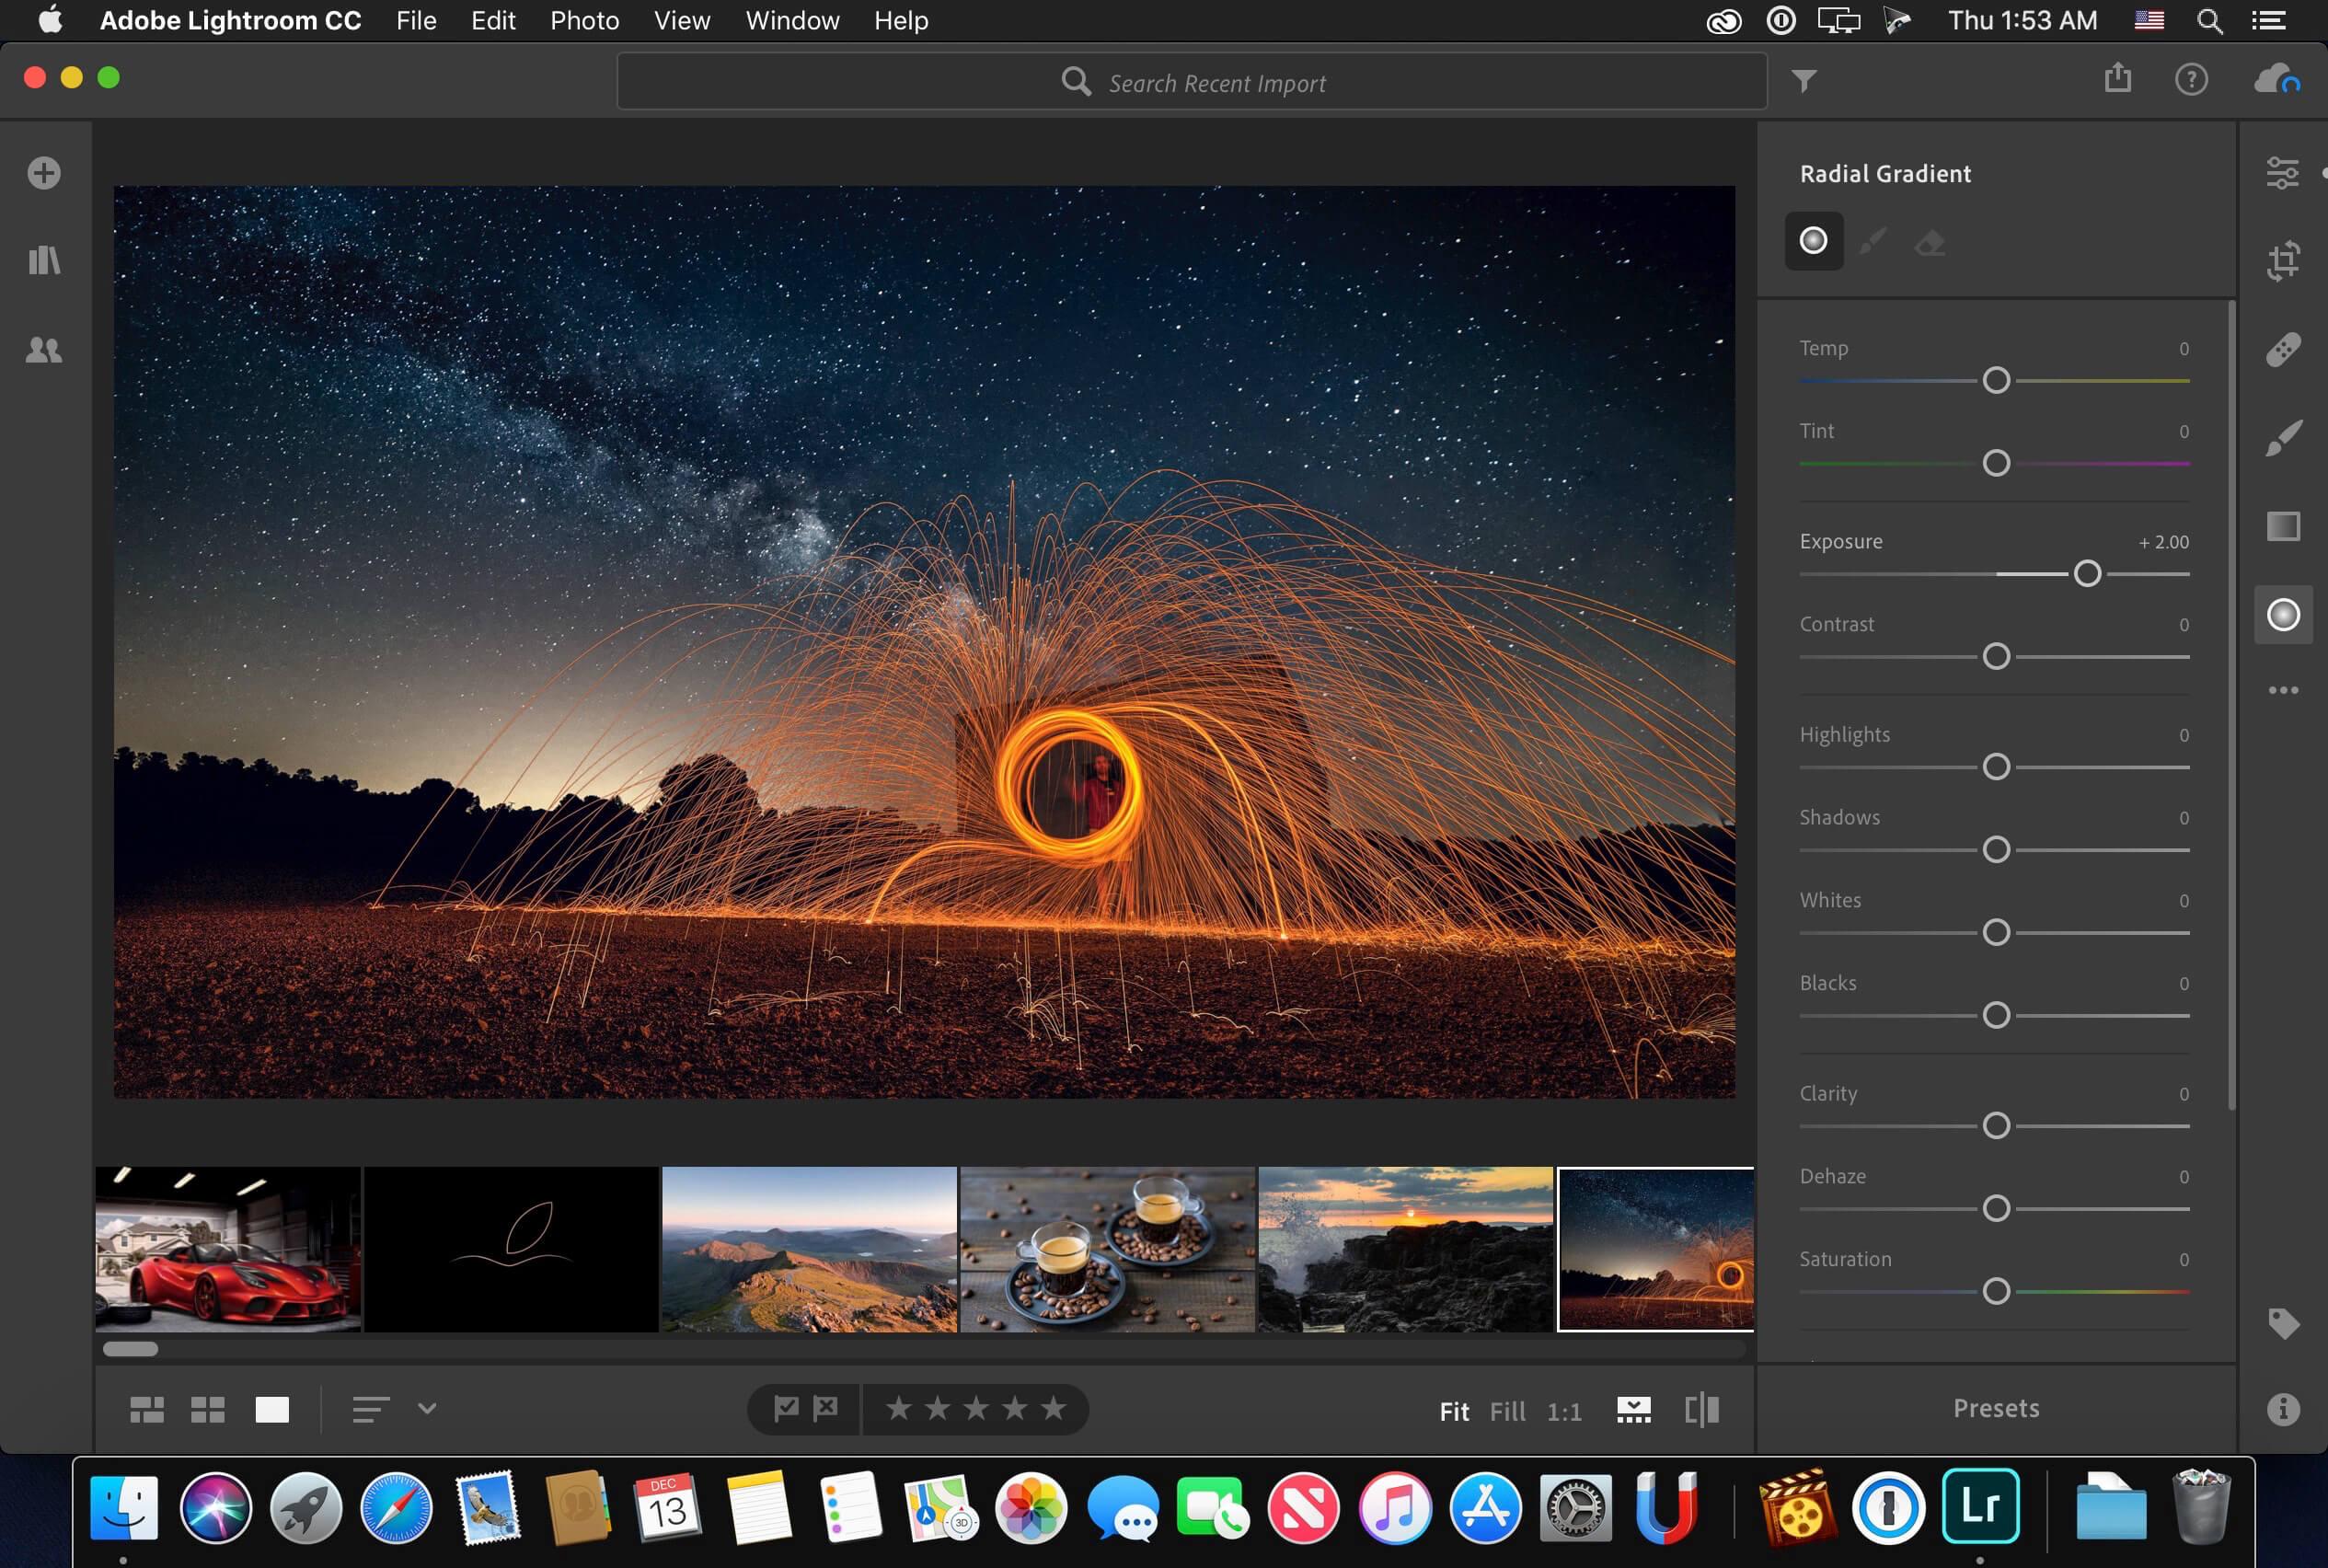 Adobe Photoshop Lightroom CC windows